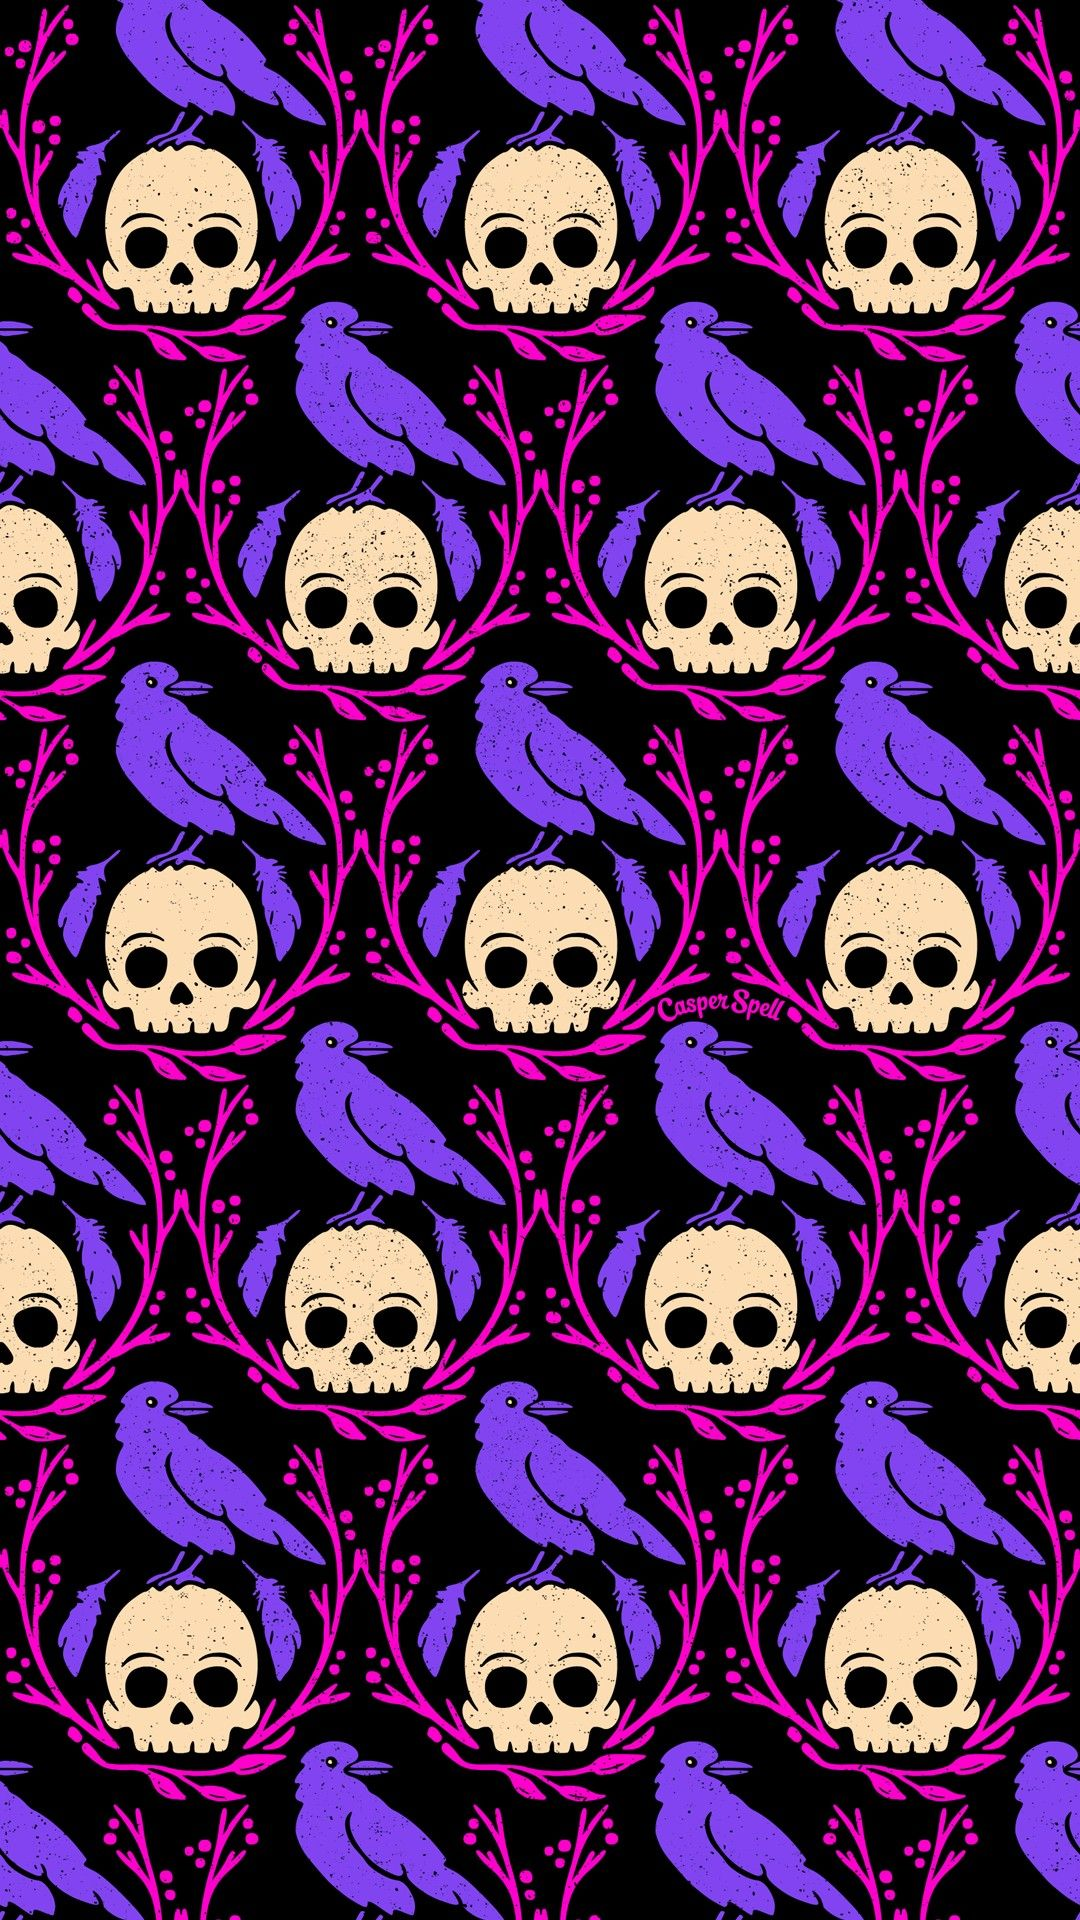 Crows skulls Crow on skull Halloween spooky cute creepy